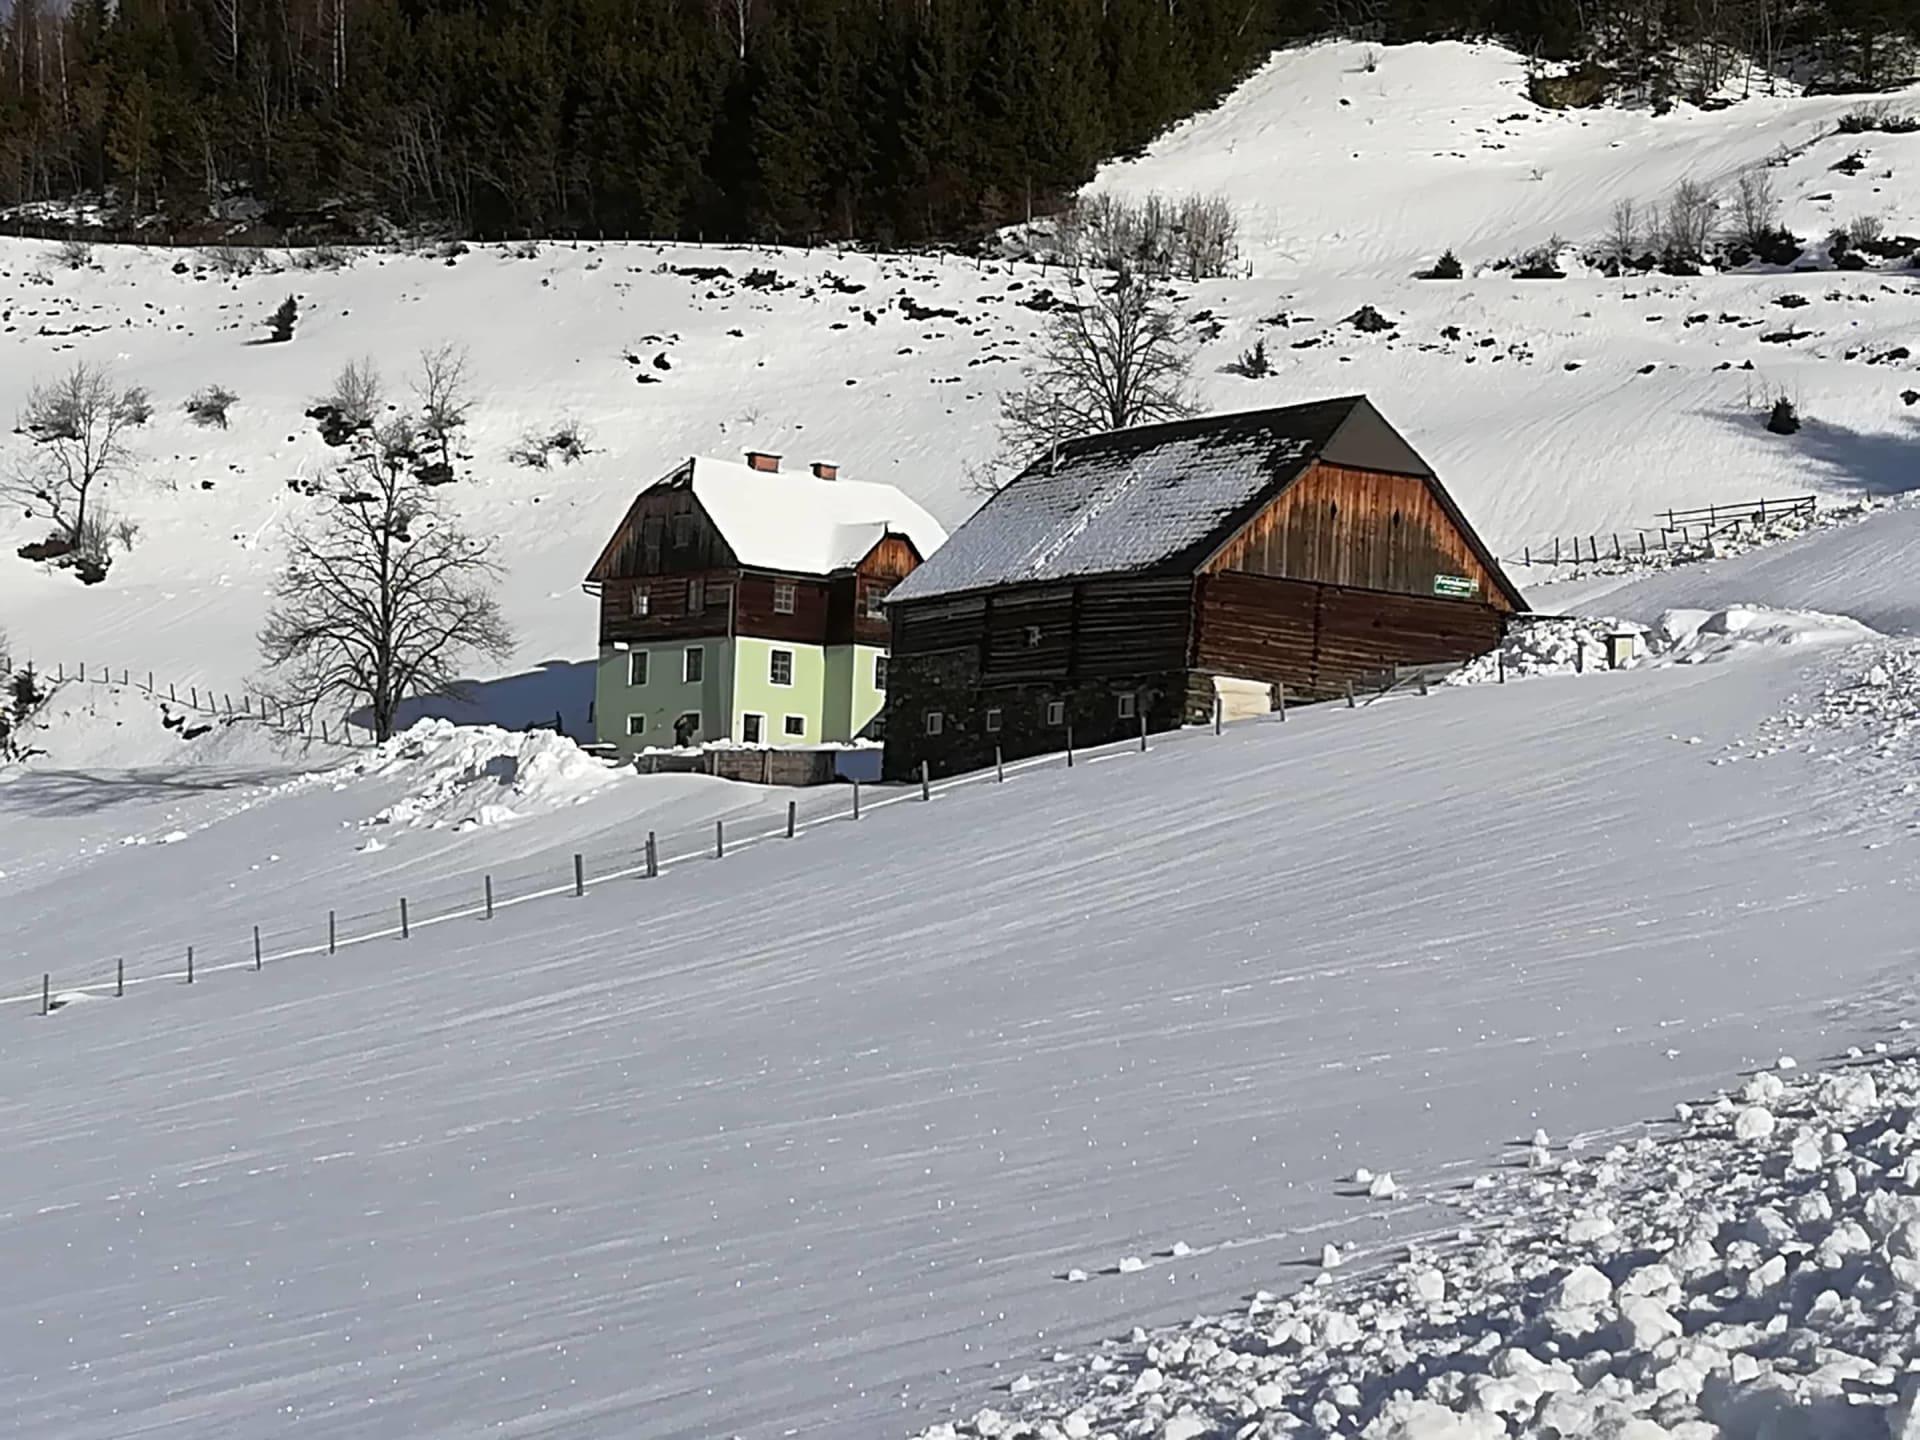 Arnoldhof